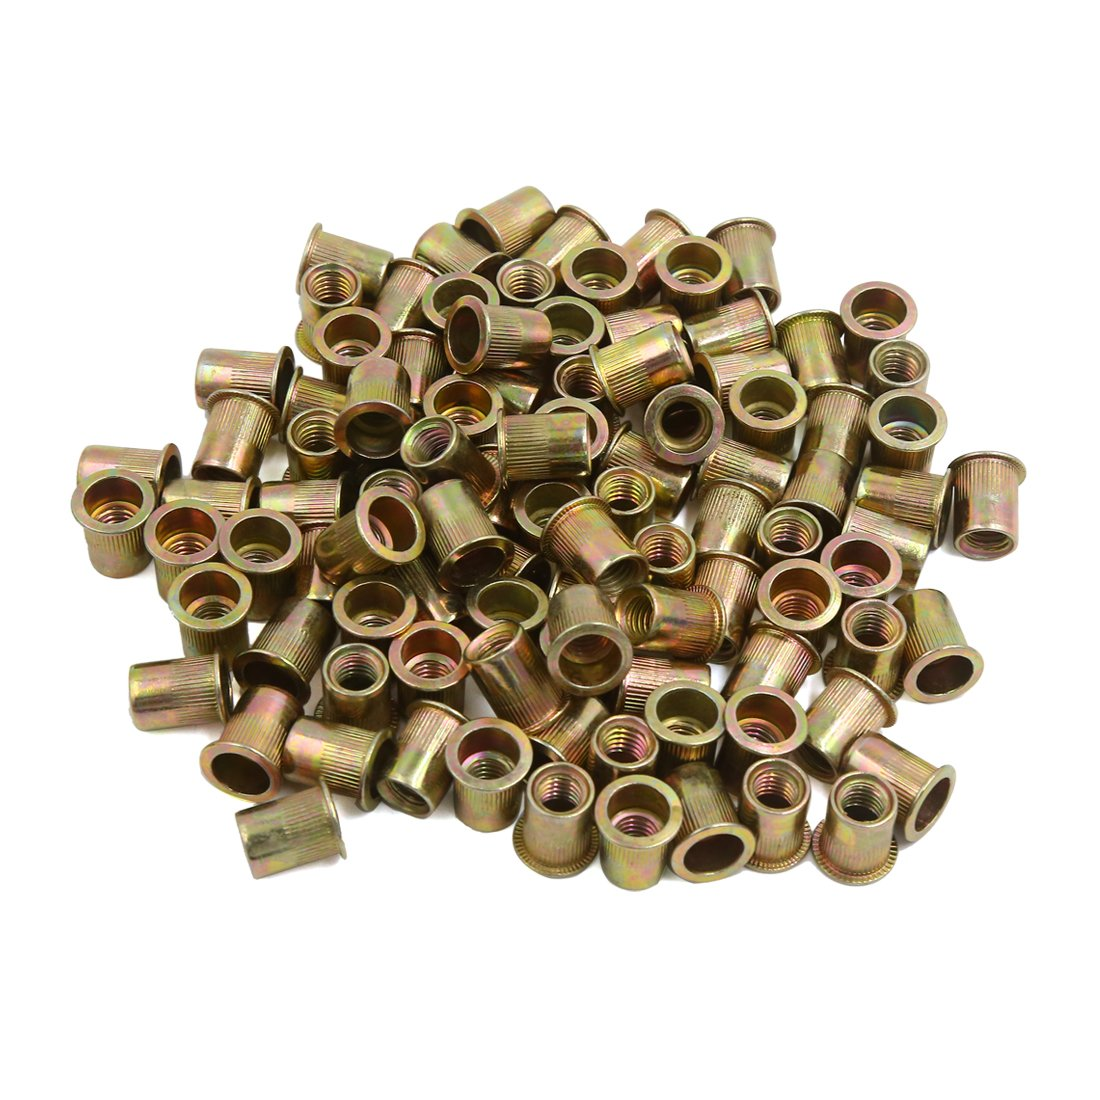 uxcell 100 Pcs 3/8-16 Bronze Tone Stainless Steel Thread Rivet Nut Insert Nutserts